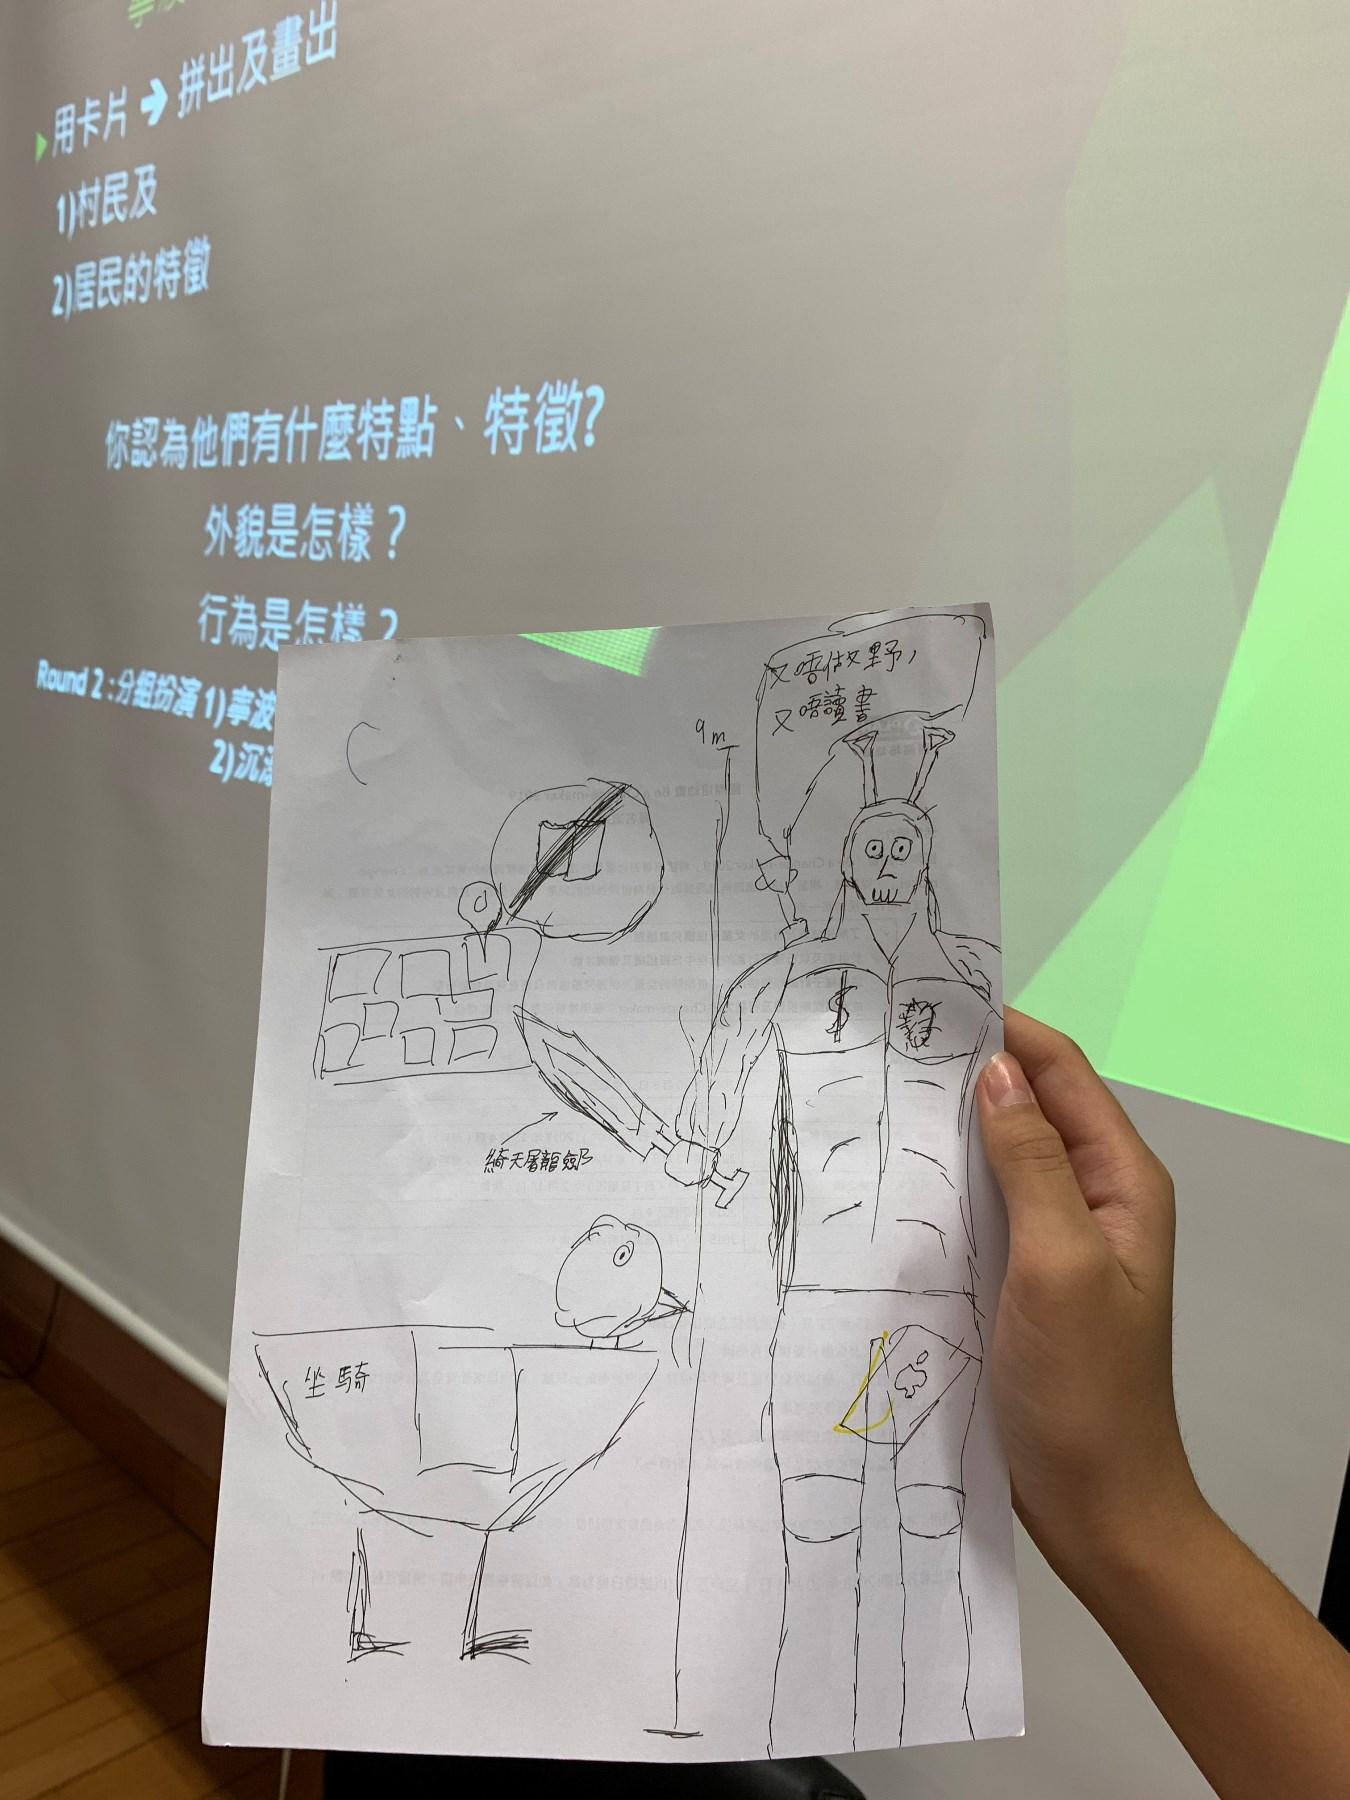 http://npc.edu.hk/sites/default/files/img_1504_3.jpg